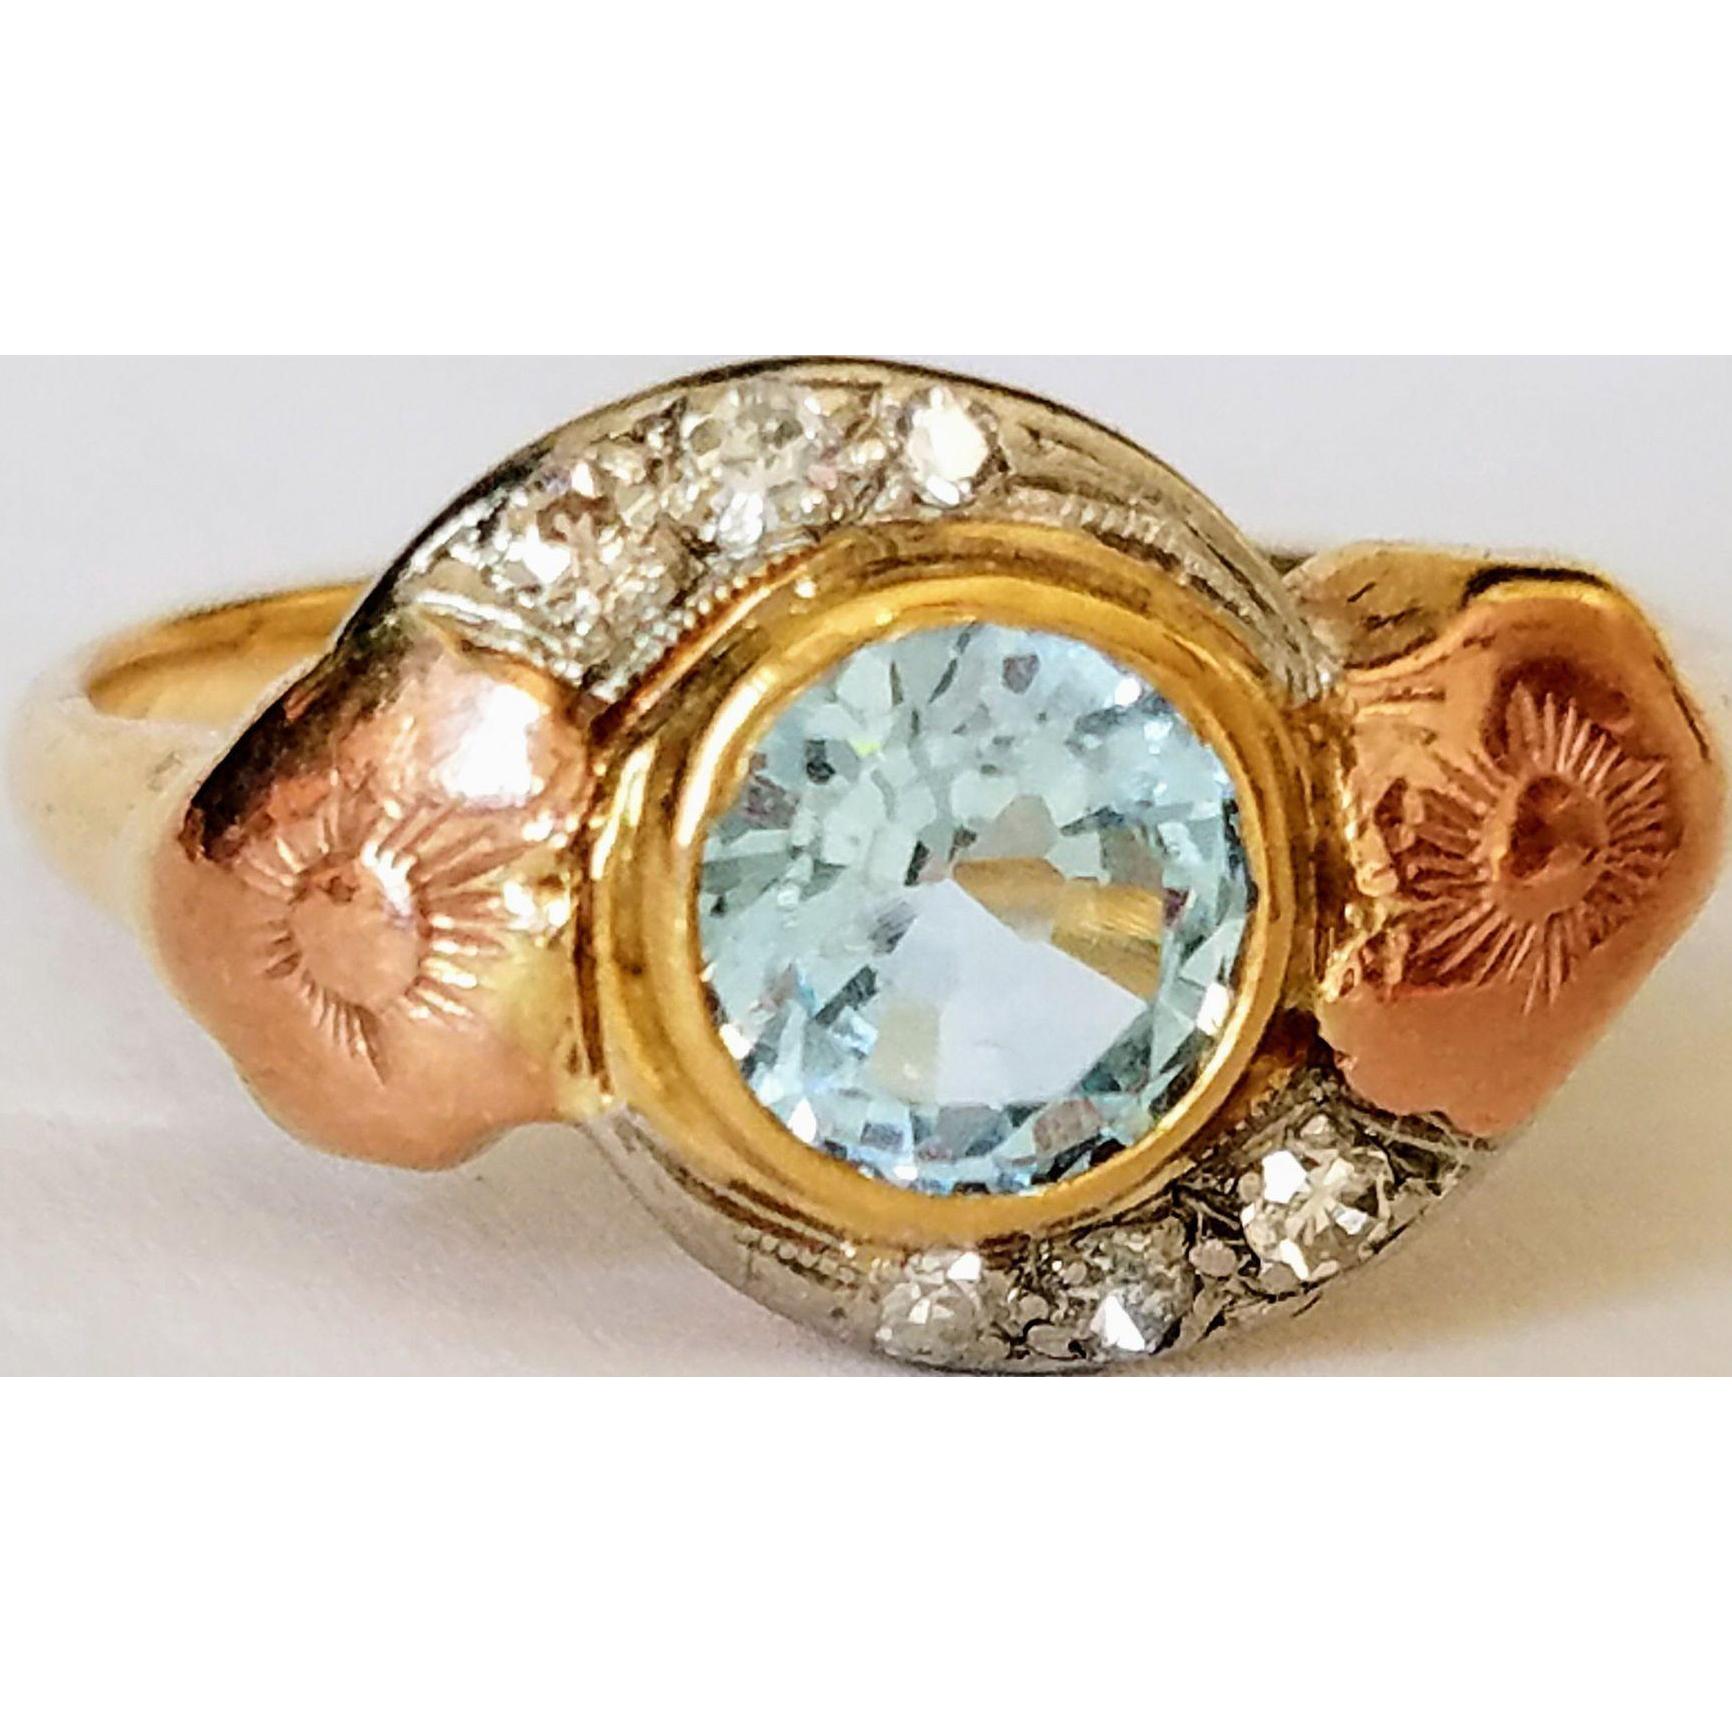 Vintage 14K Blue Topaz w/ Old-Cut Diamonds Ring 8.5